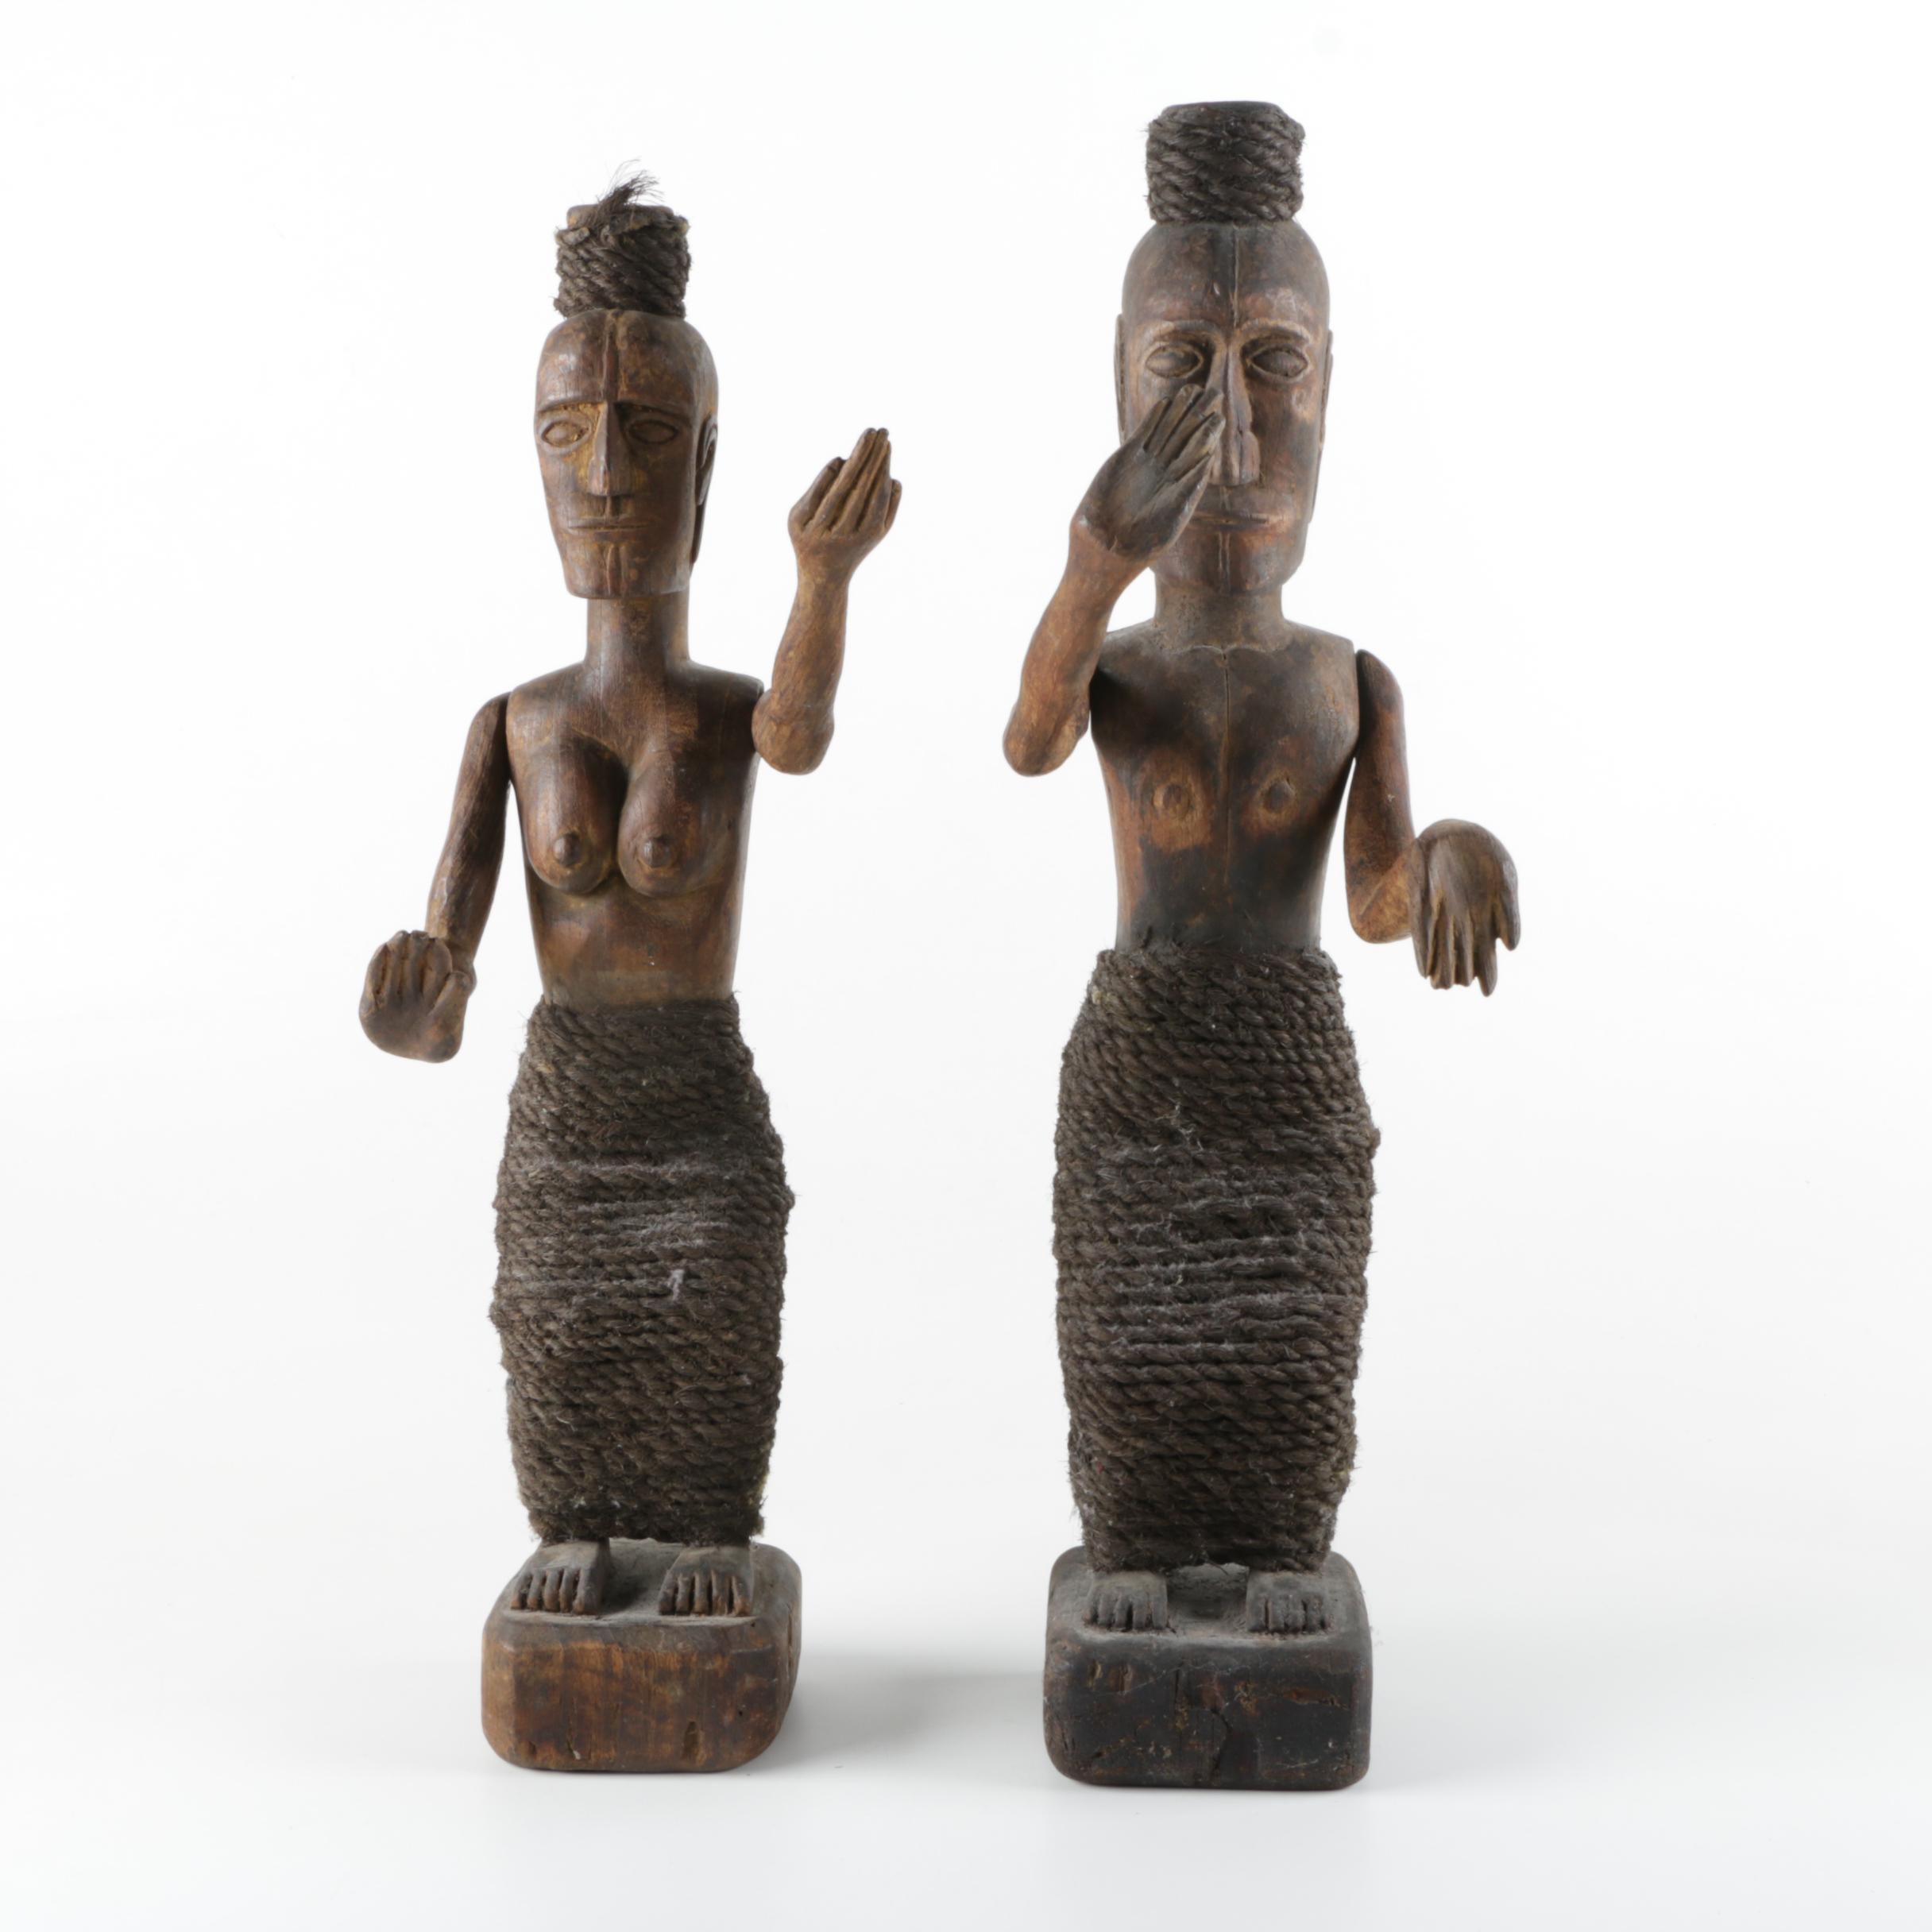 Carved Wood Figures